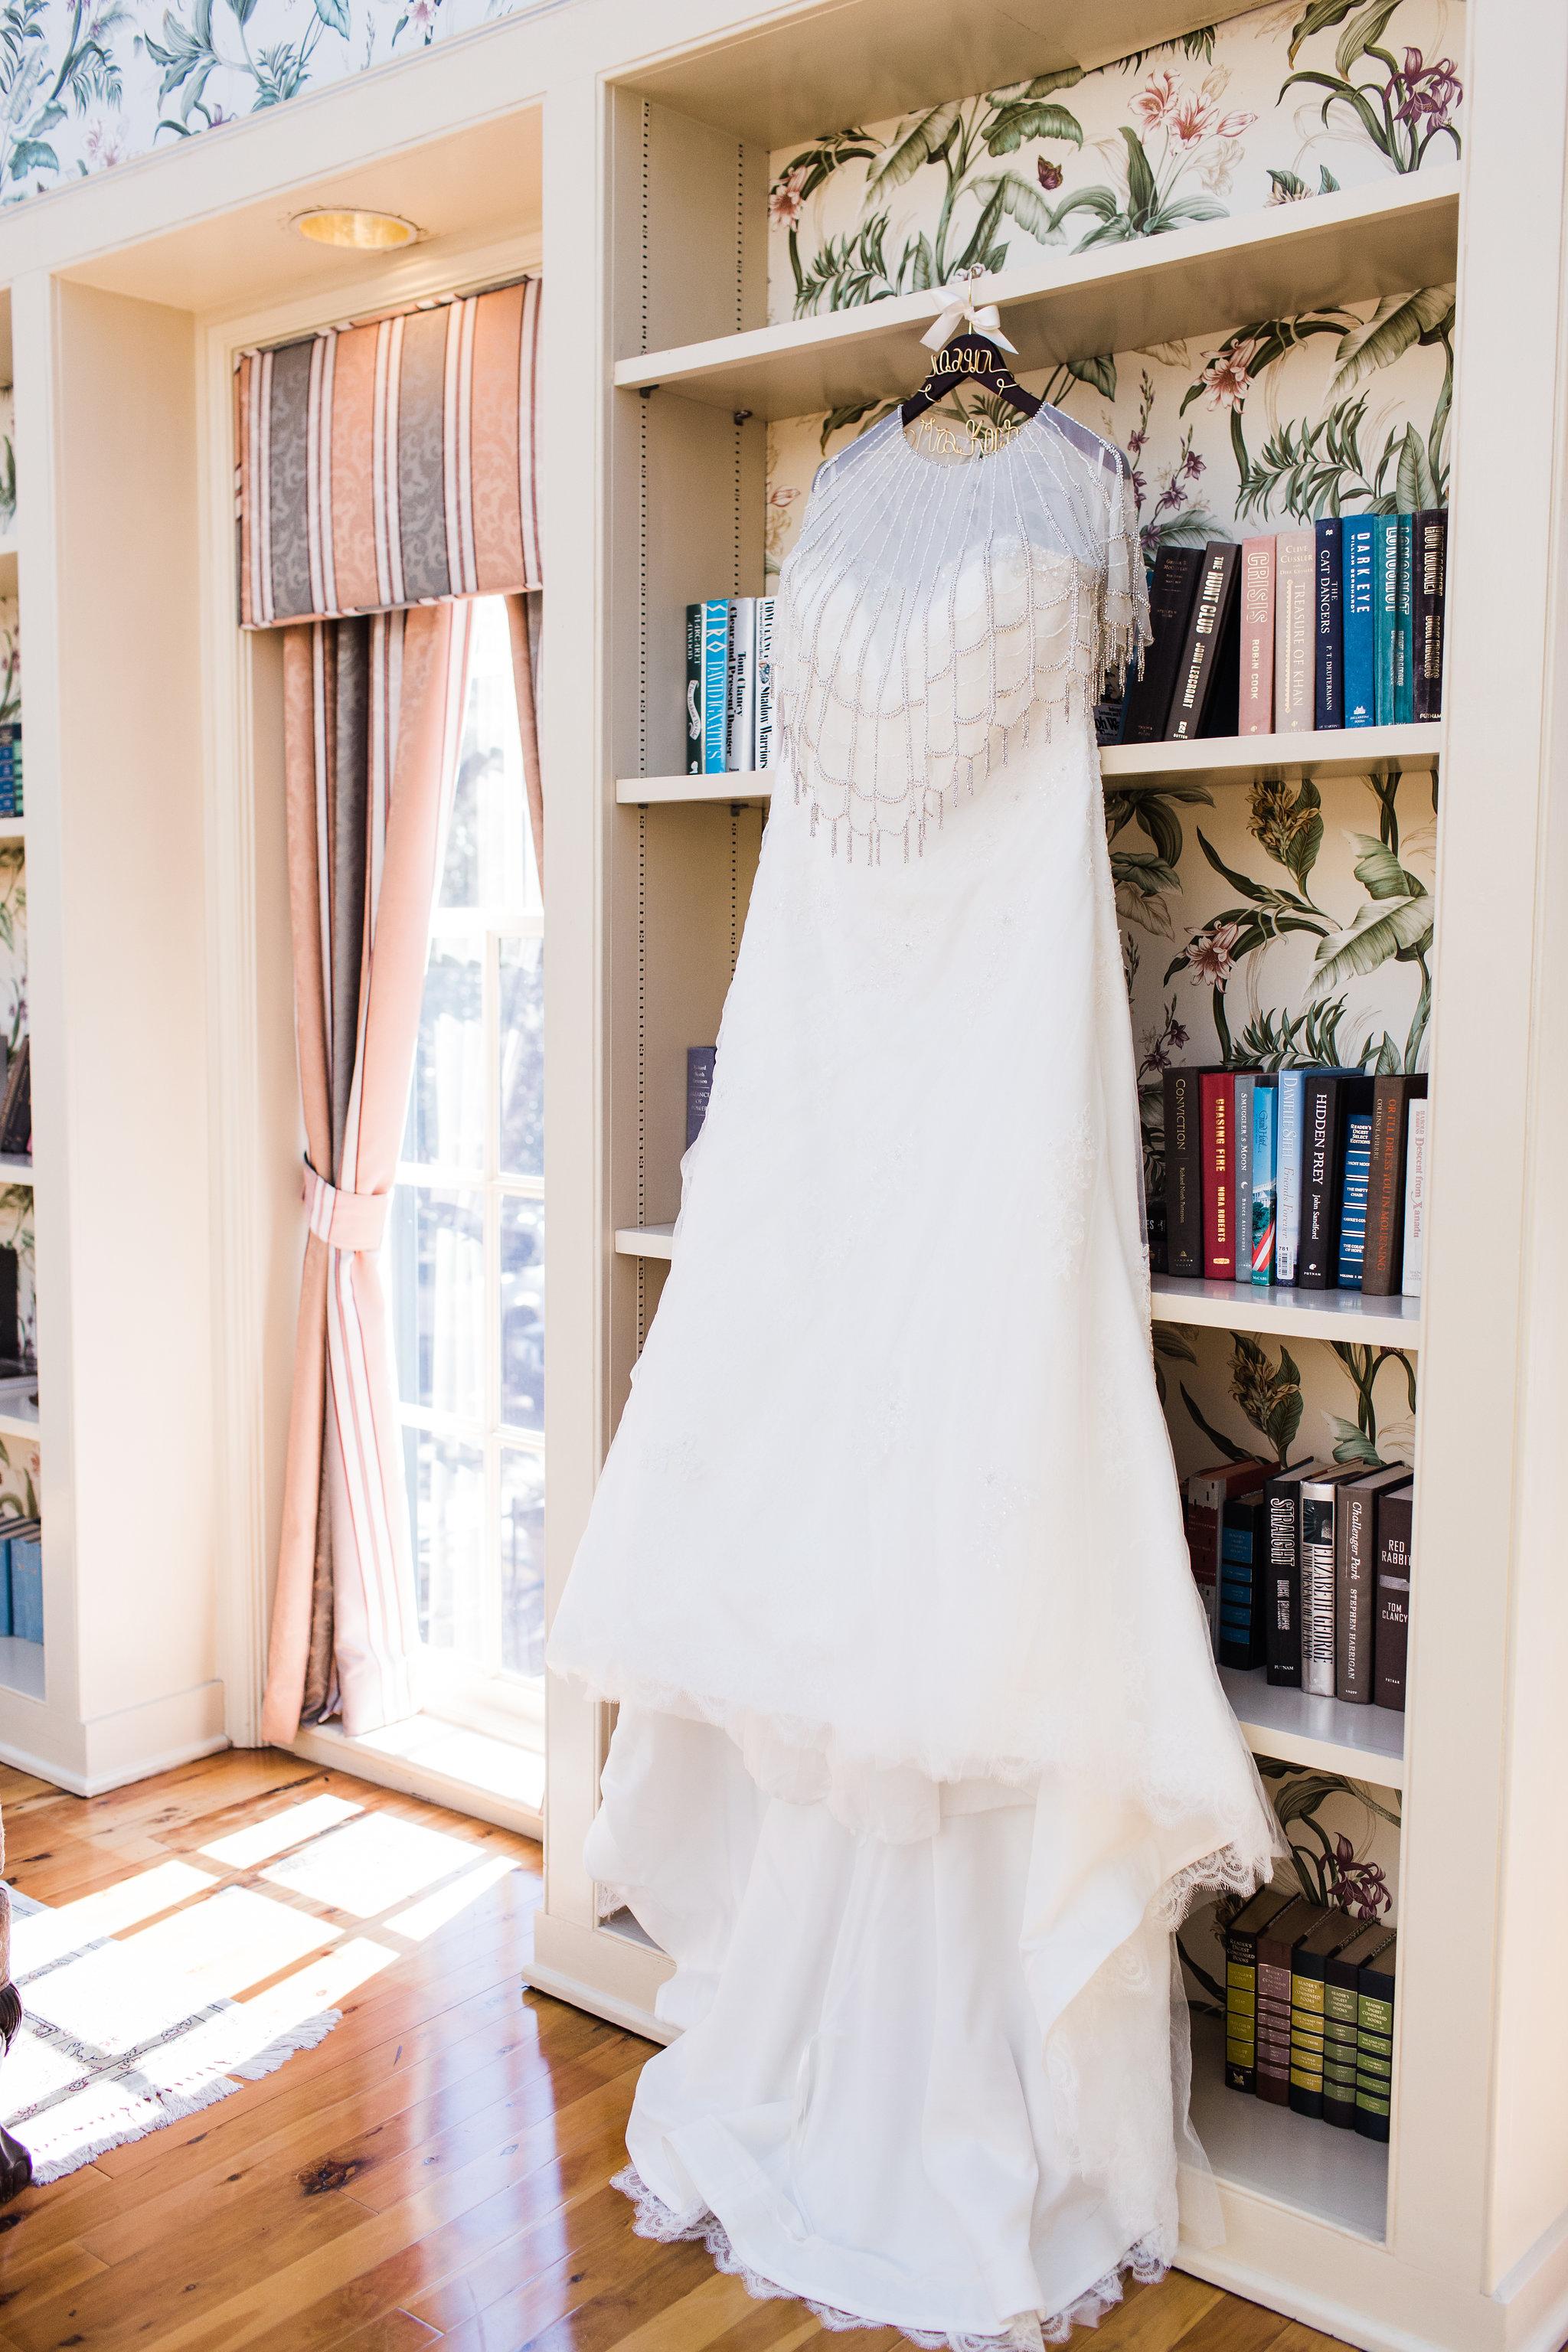 apt-b-photography-kristy-rob-wormsloe-elopment-savannah-wedding-photographer-savannah-elopement-wormsloe-wedding-historic-savannah-wedding-dress-3.jpg